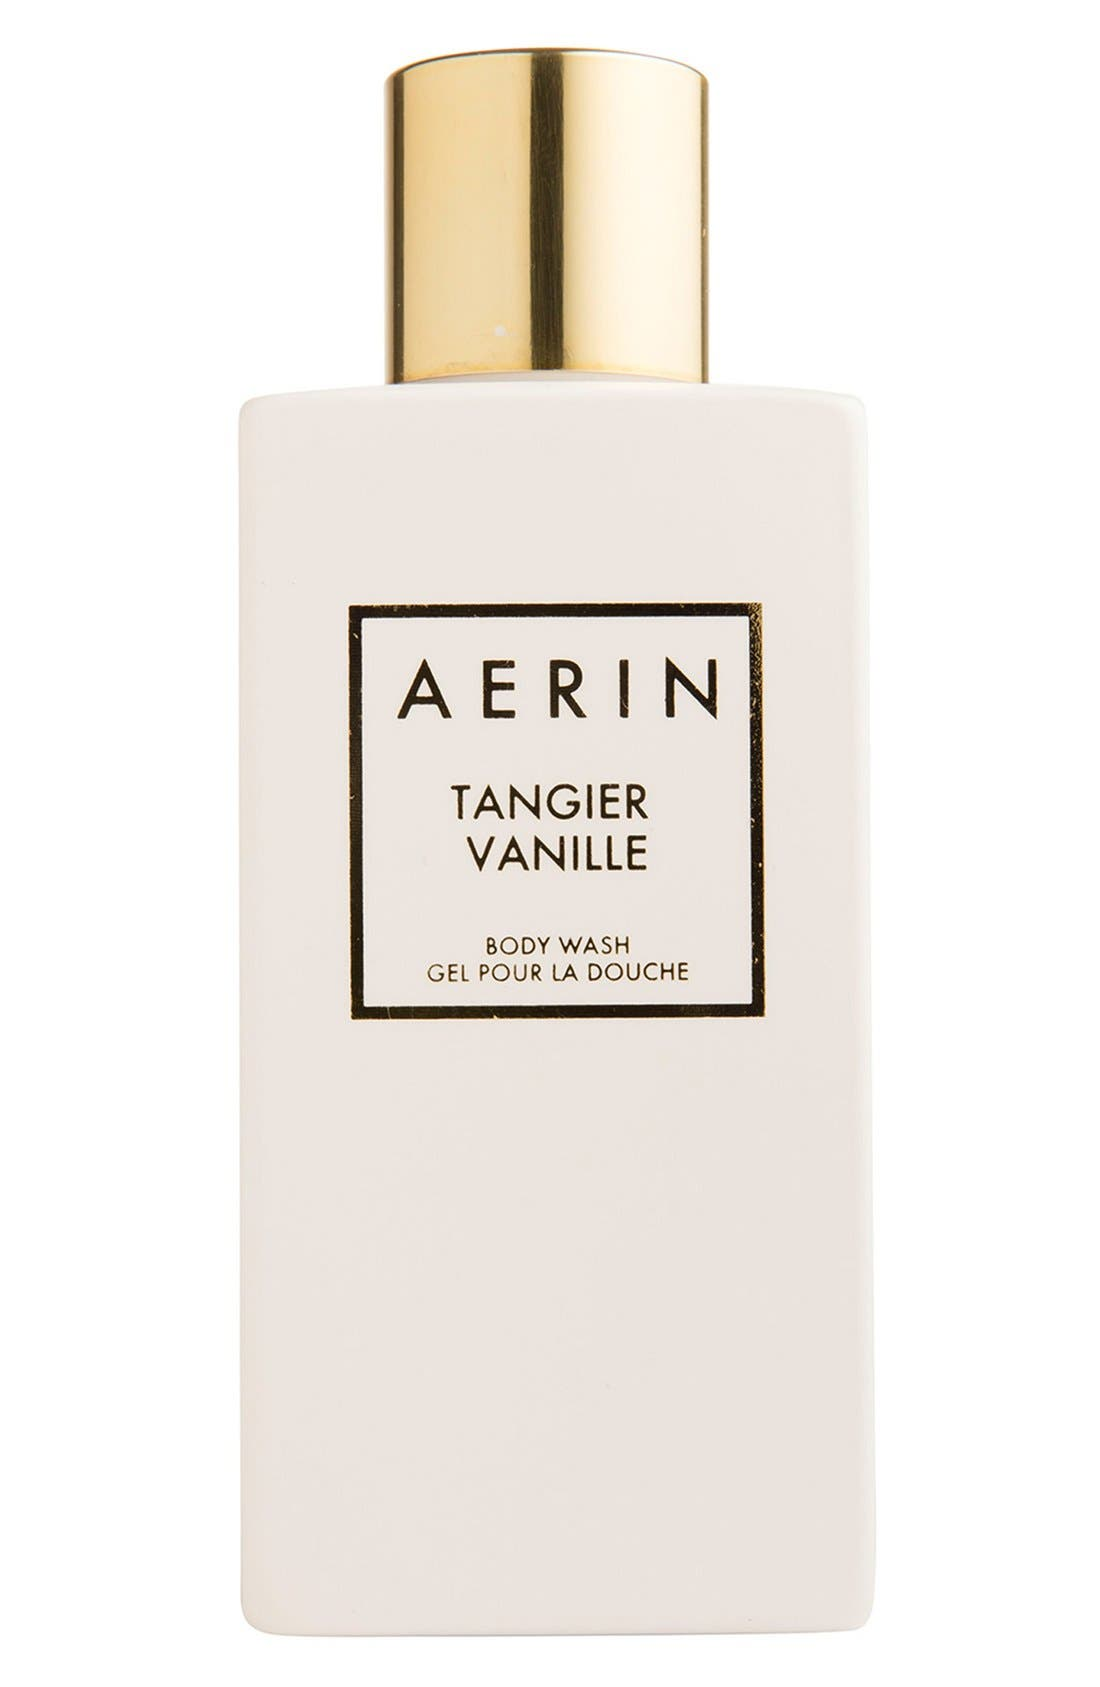 AERIN Beauty Tangier Vanille Body Wash,                             Main thumbnail 1, color,                             000